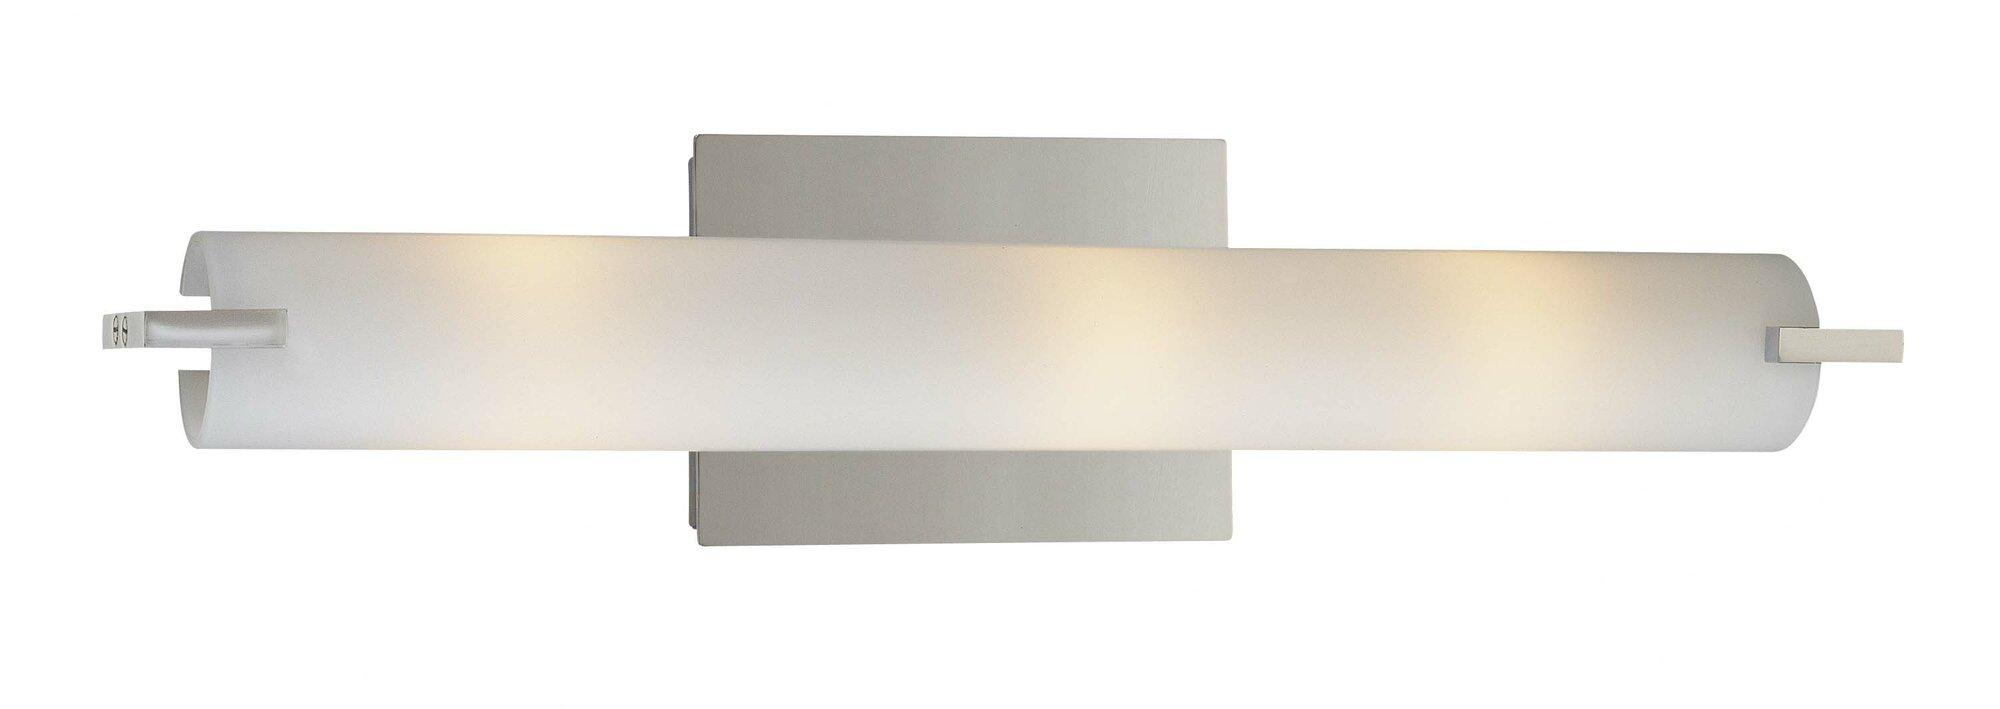 George Kovacs By Minka Tube 3 Light Vanity Light EBay